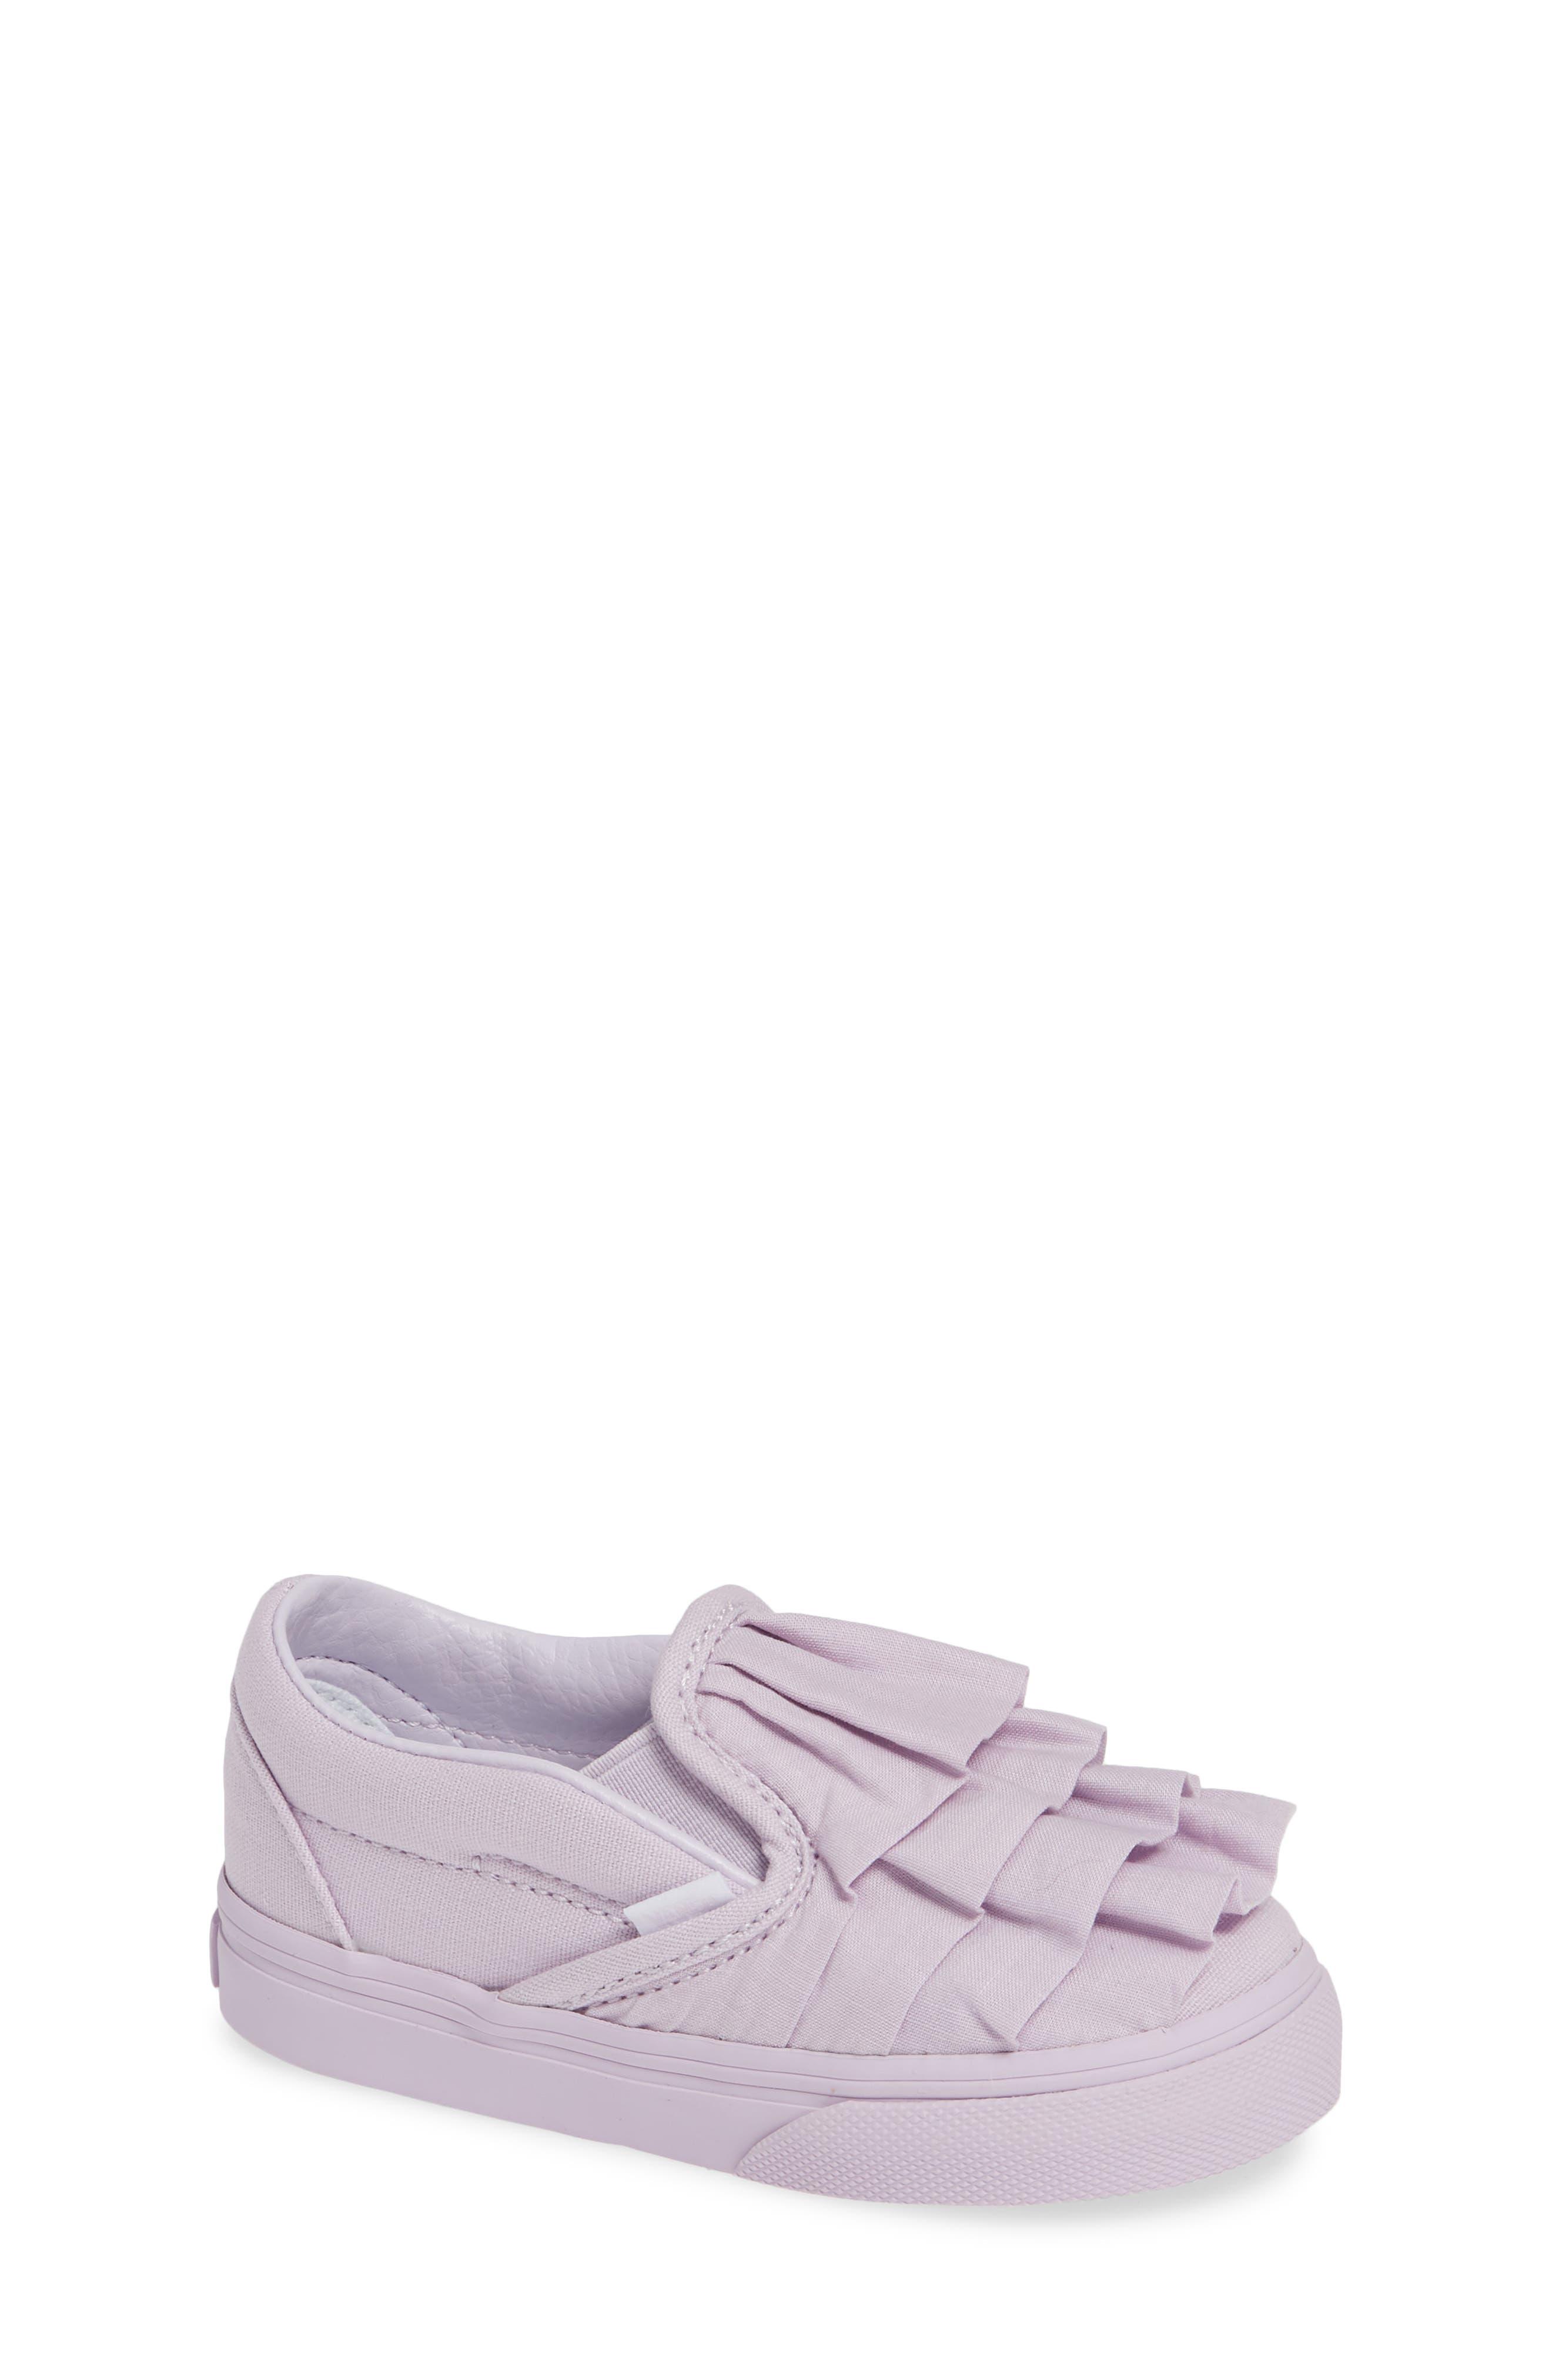 Ruffle Classic Slip-On Sneaker,                             Main thumbnail 1, color,                             530